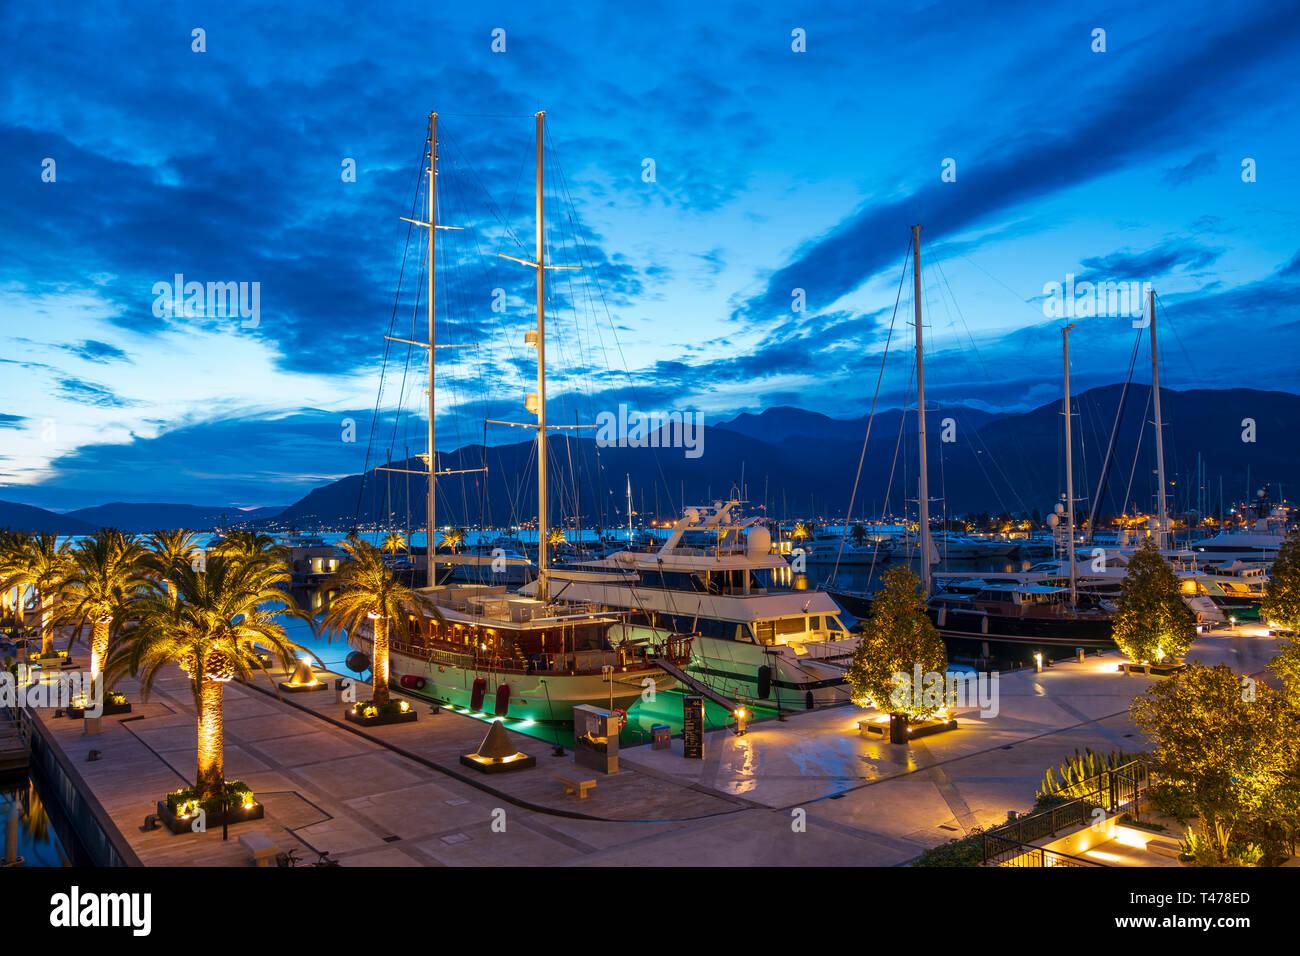 Night view of Porto Montenegro Tivat, Montenegro April 12 2019 - Stock Image